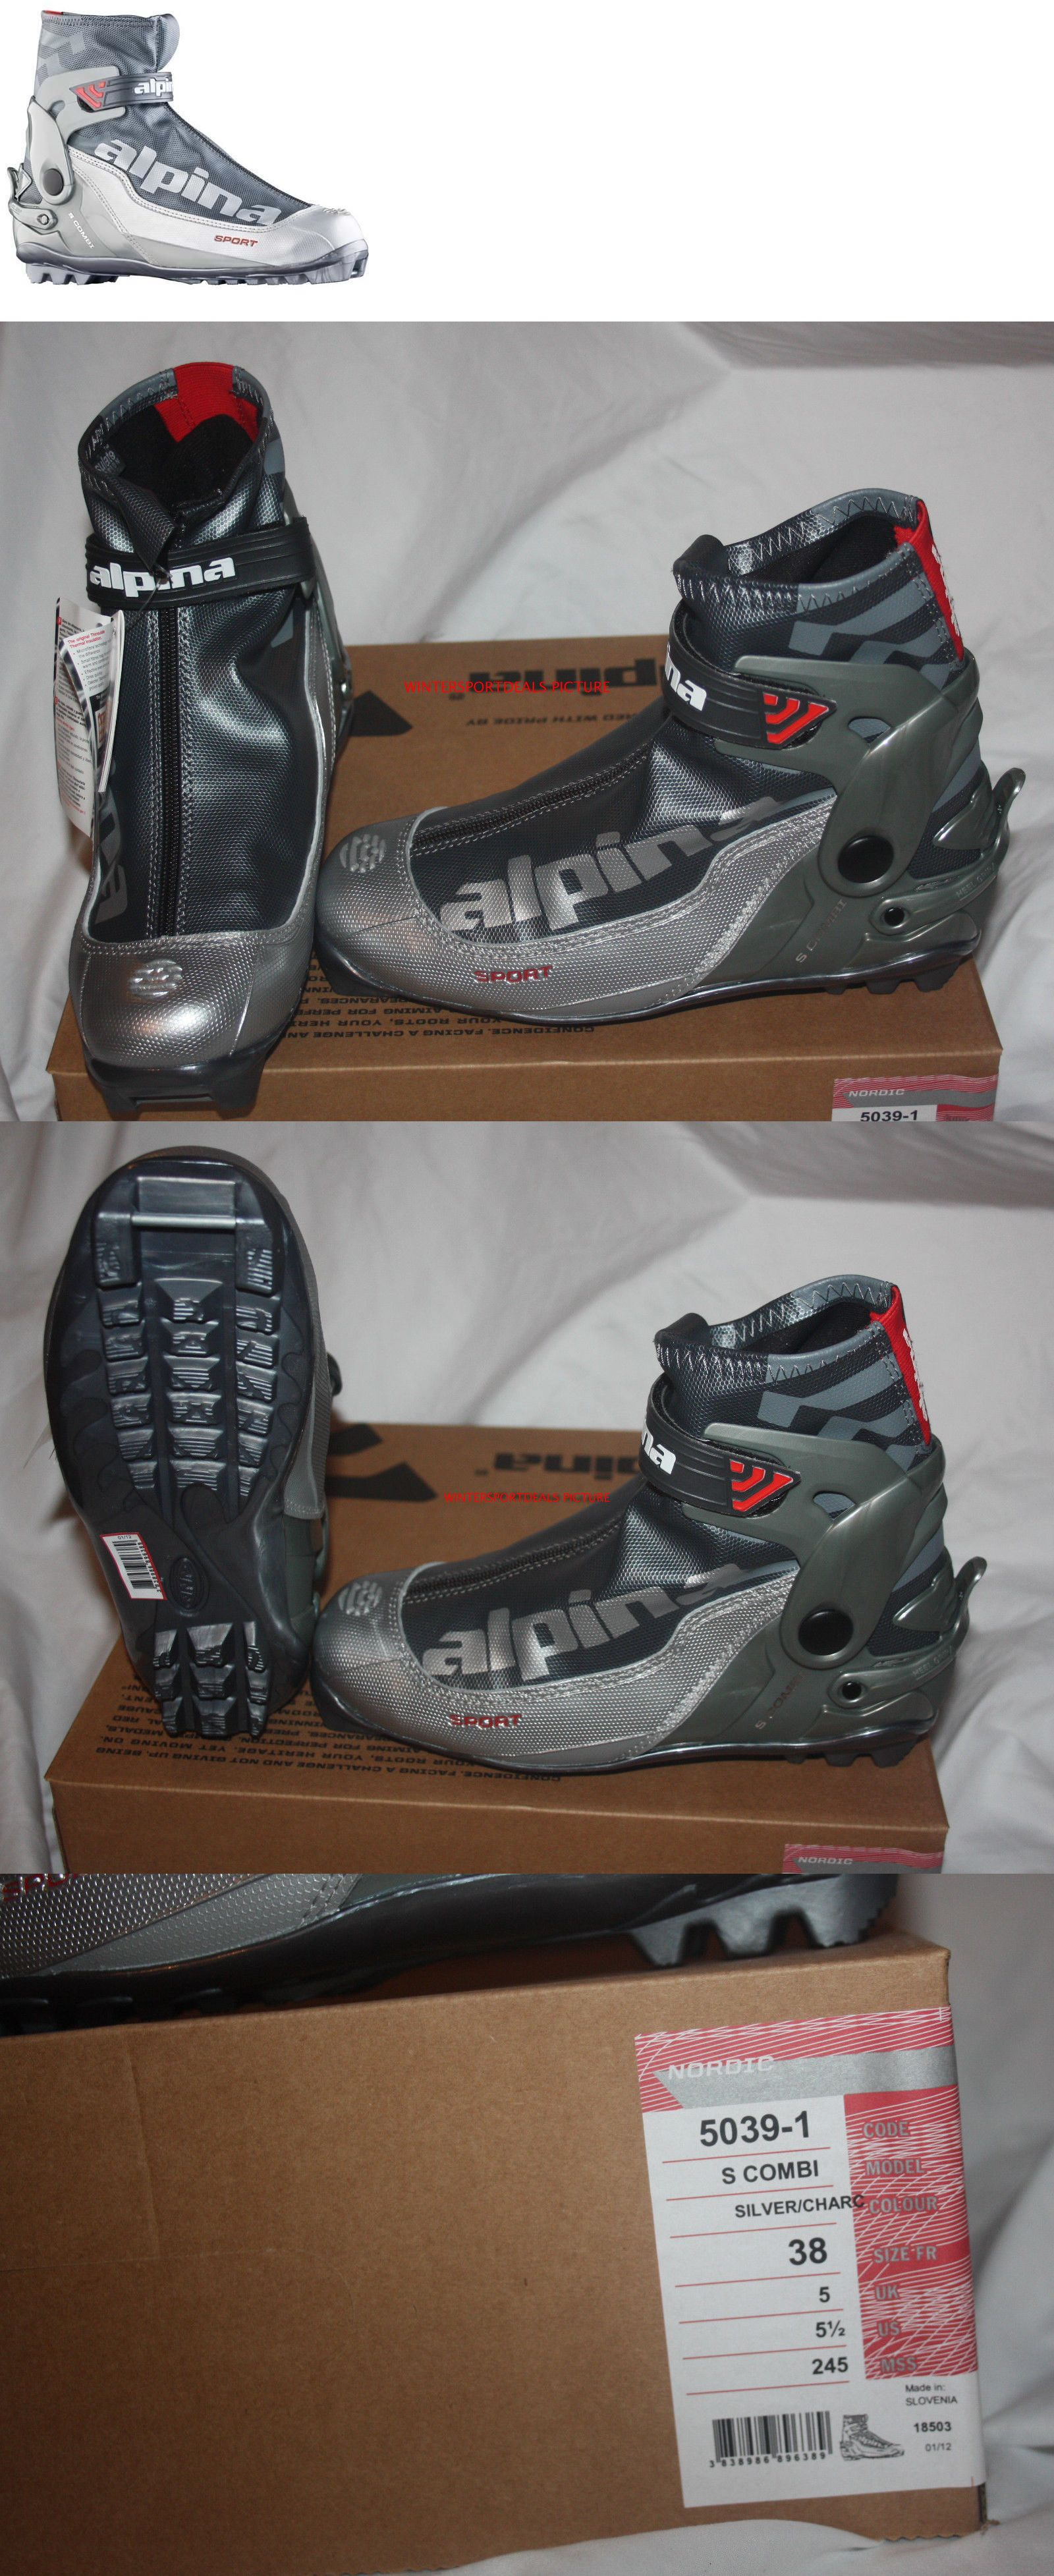 Boots Alpina S Combi Nnn Cross Country Ski Boots Silver Charc - Alpina cross country ski boots